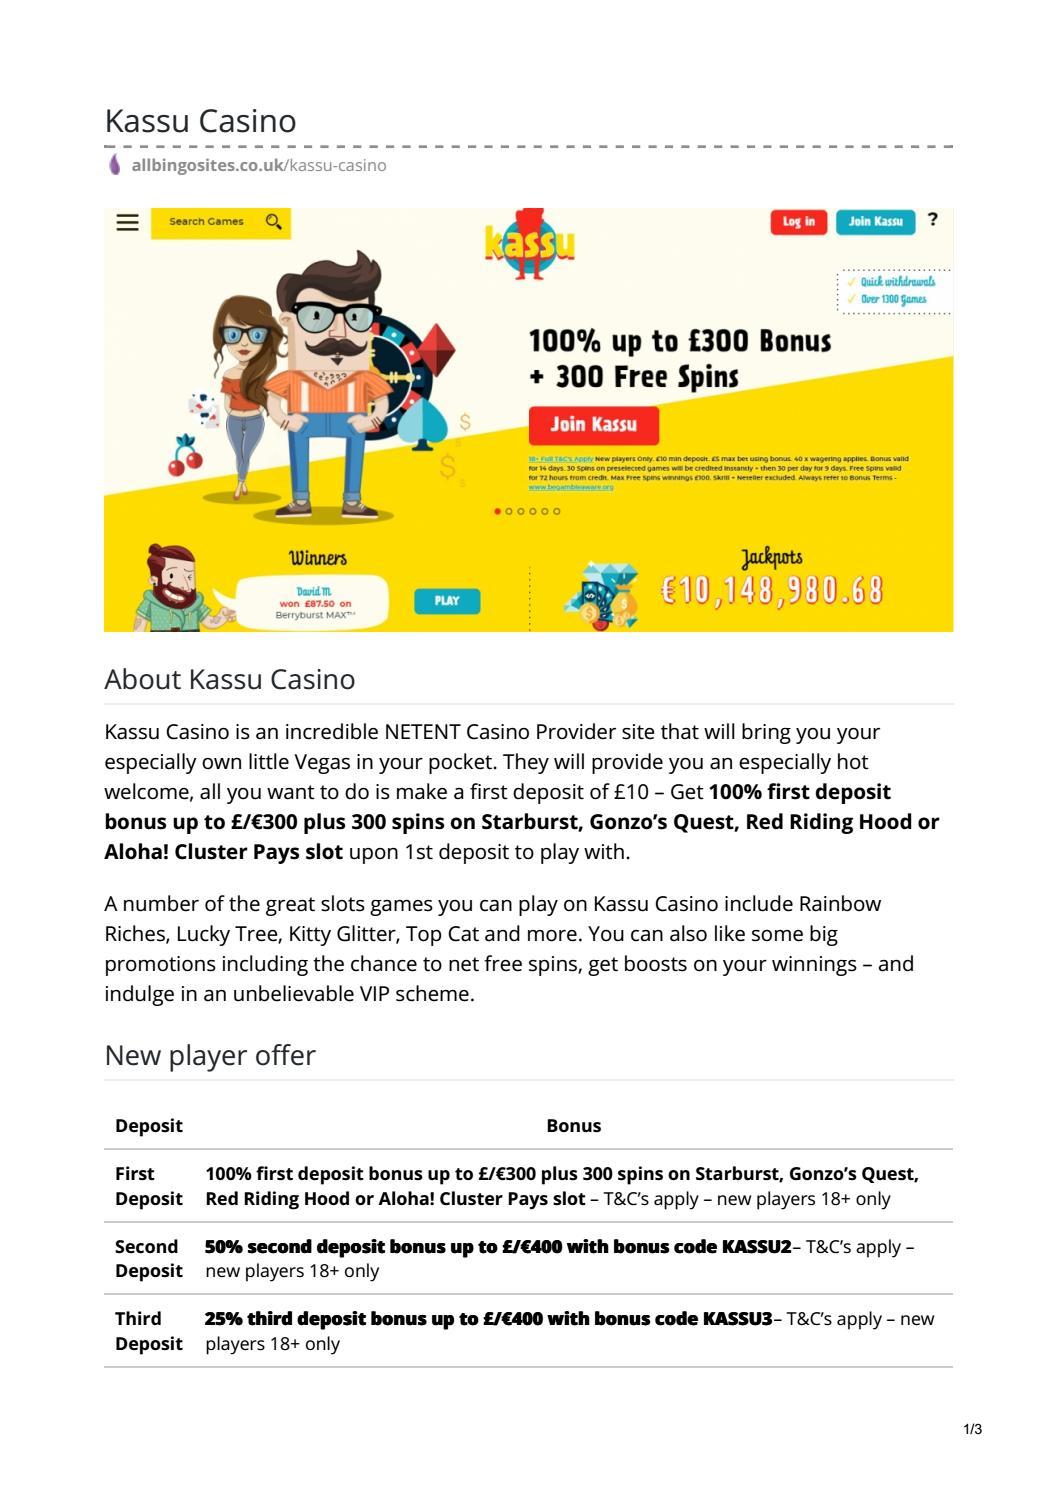 Kassu Casino 100 Deposit Bonus Best New Casino Site Uk By